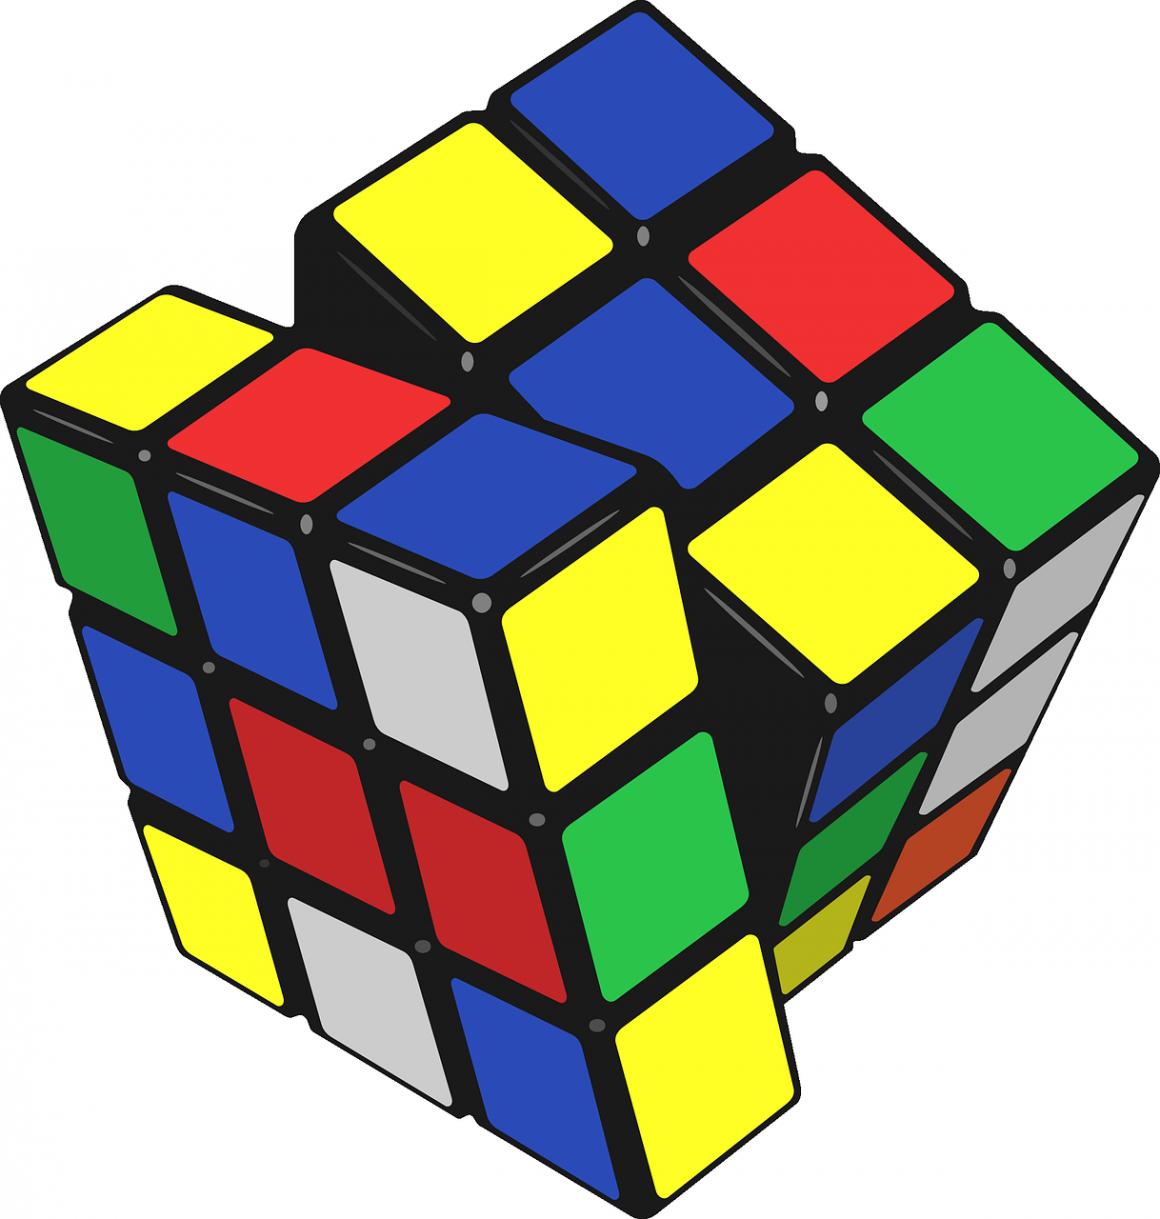 rubiks-cube-157058_1280